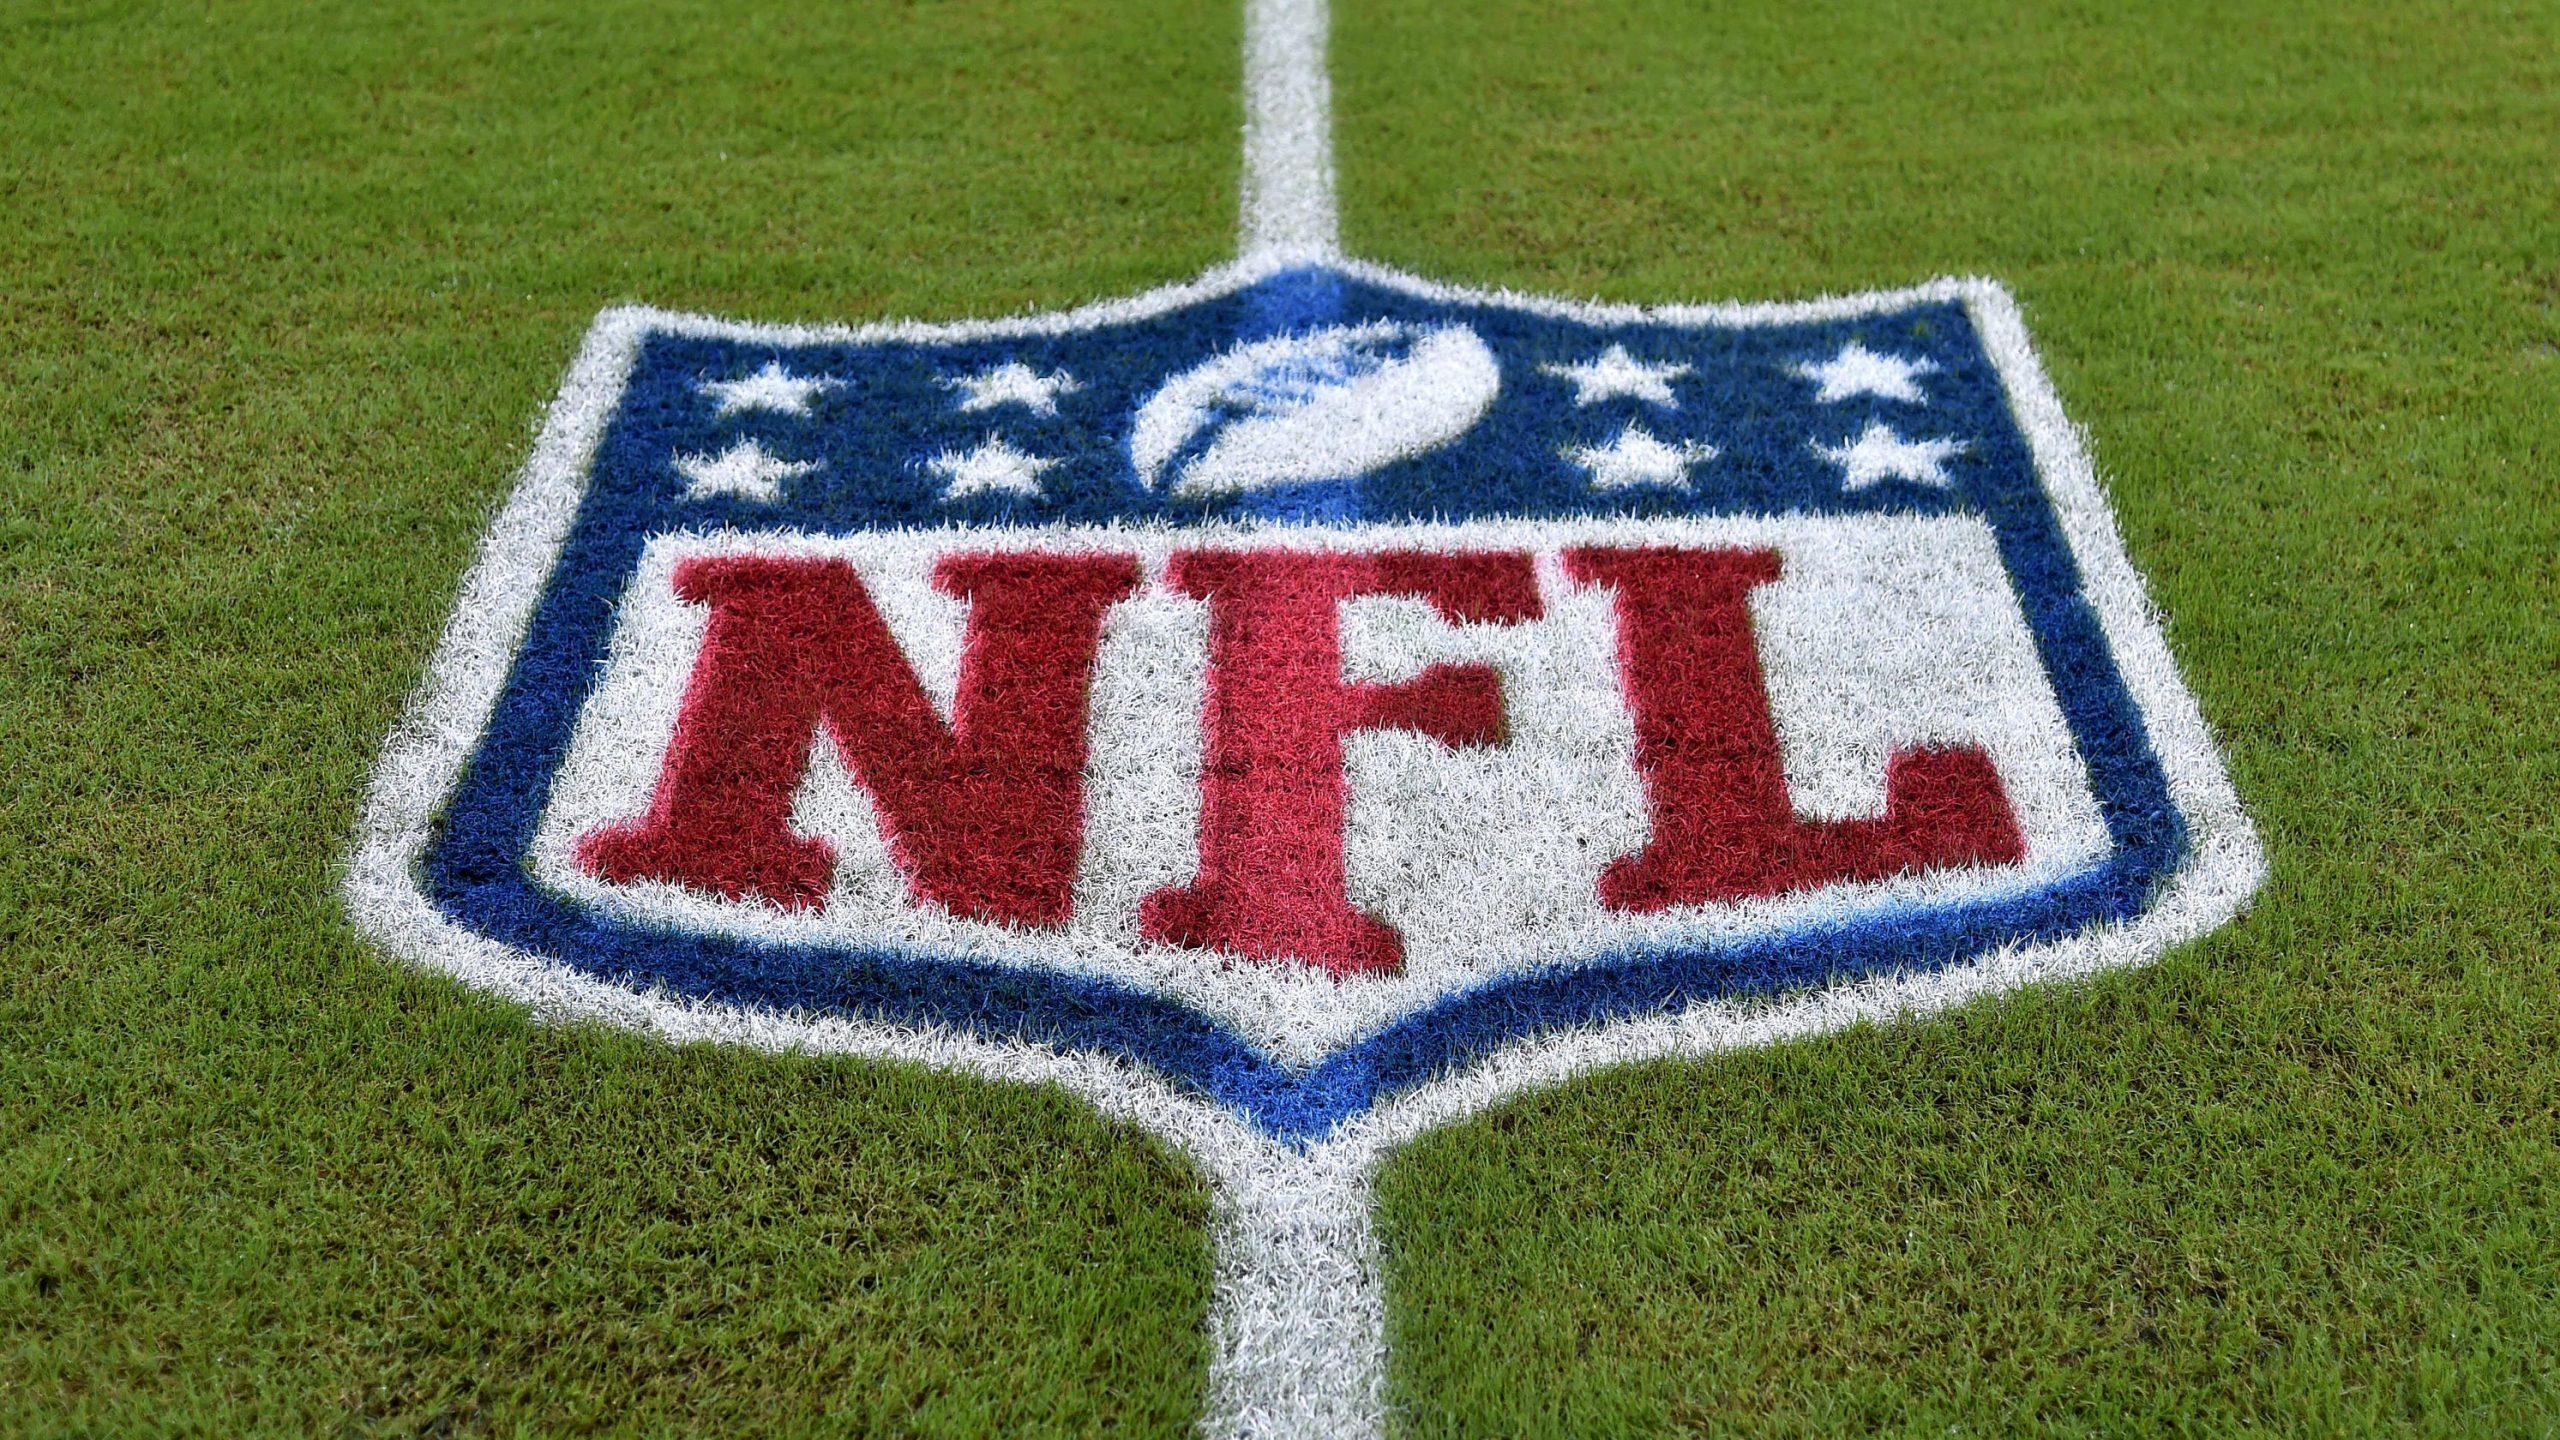 Could coronavirus disrupt NFL regular season?